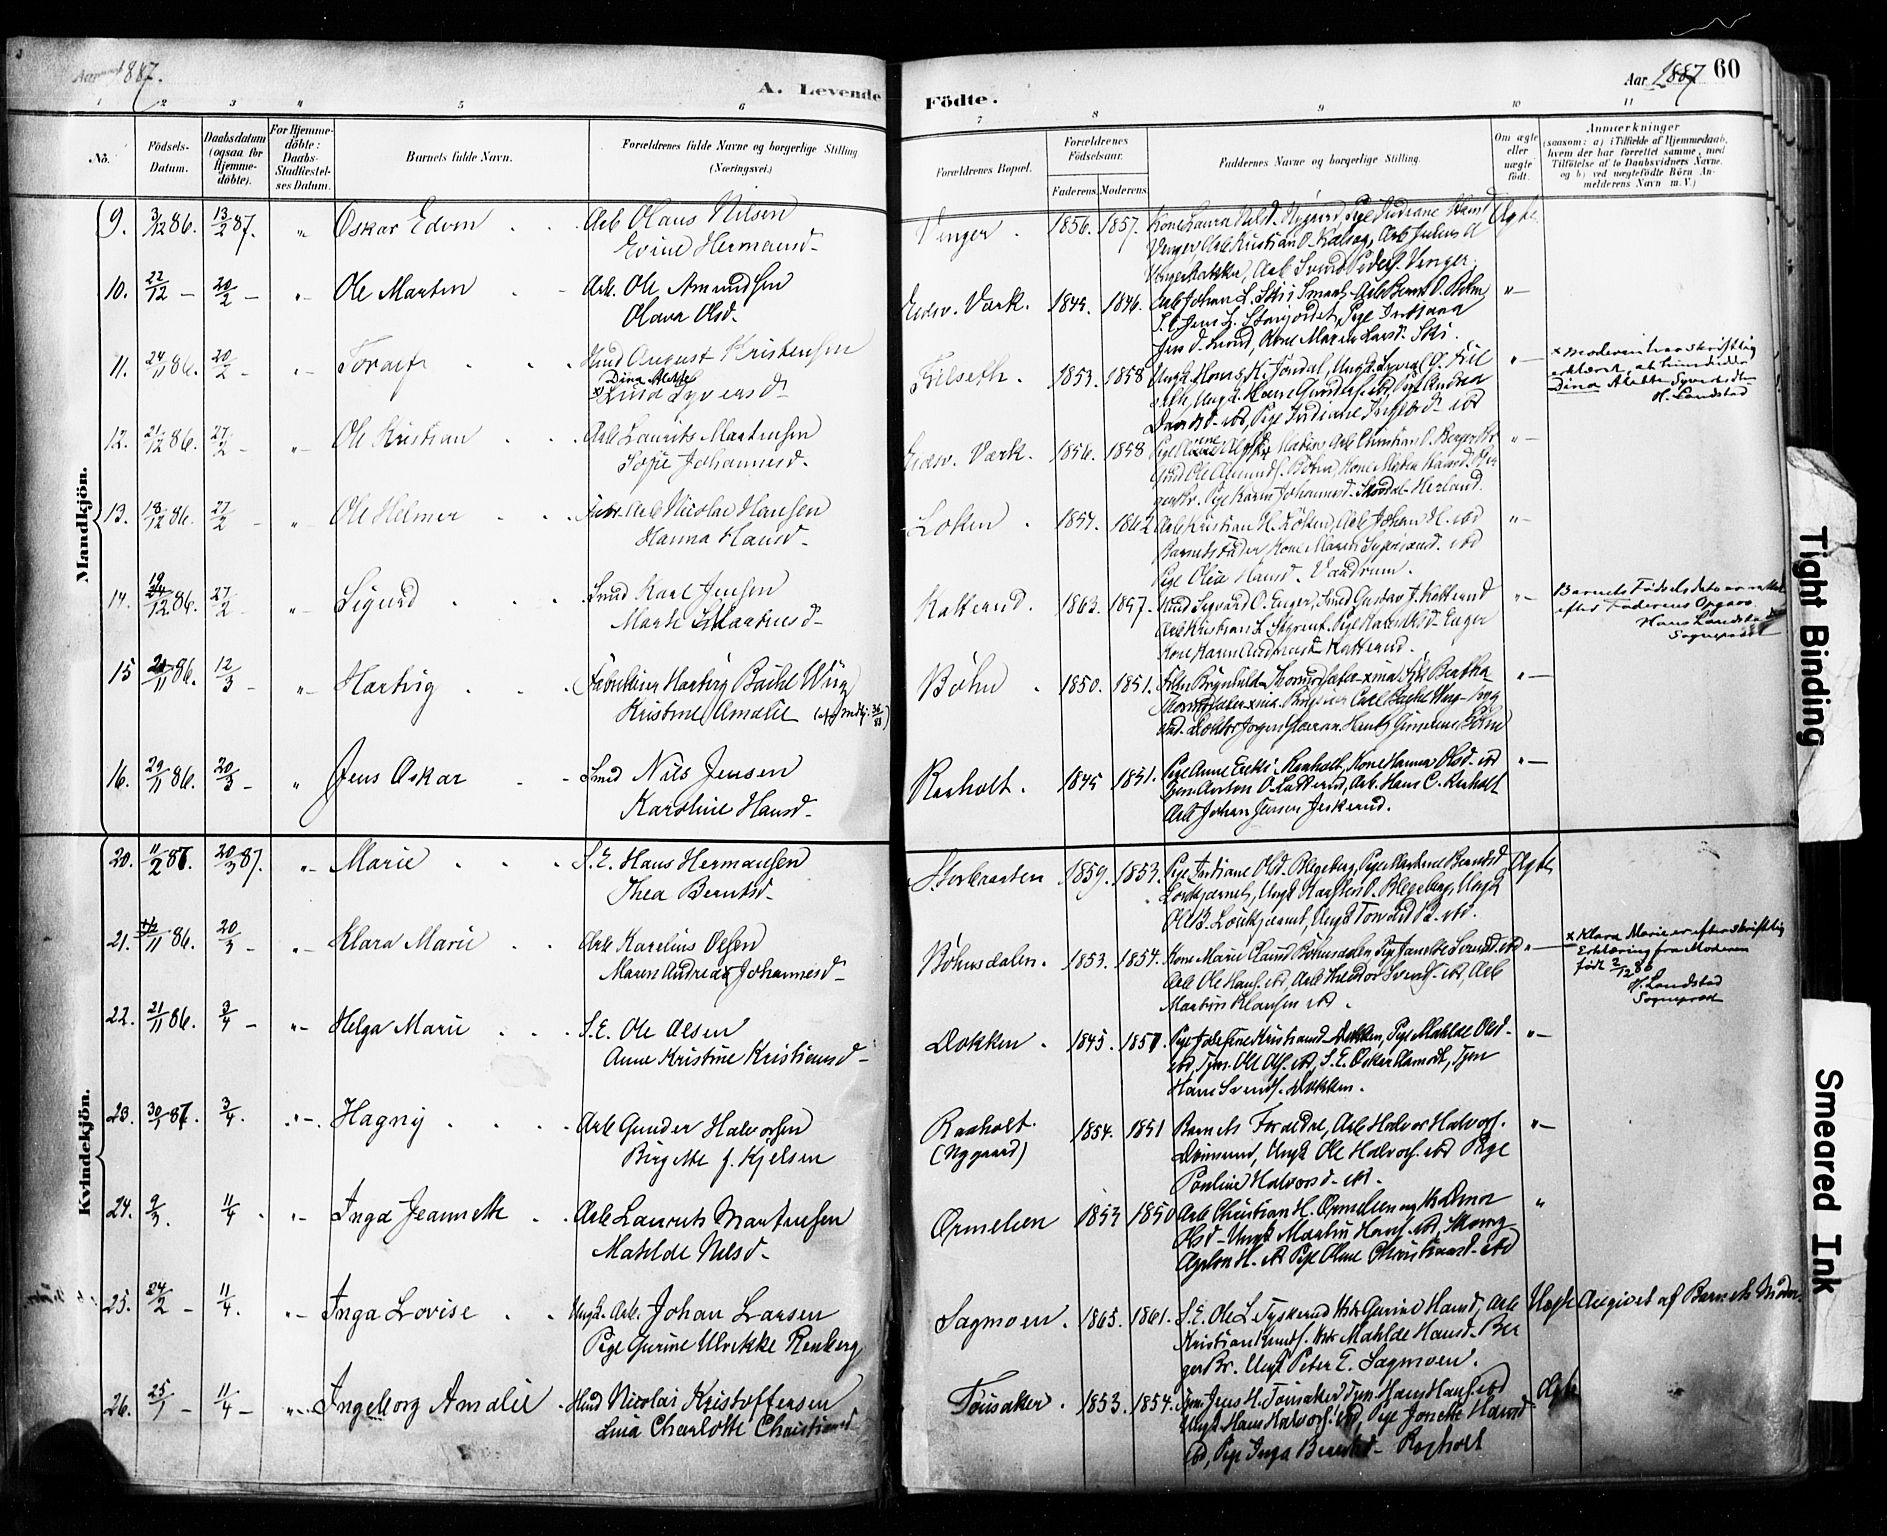 SAO, Eidsvoll prestekontor Kirkebøker, F/Fa/L0002: Ministerialbok nr. I 2, 1882-1895, s. 60